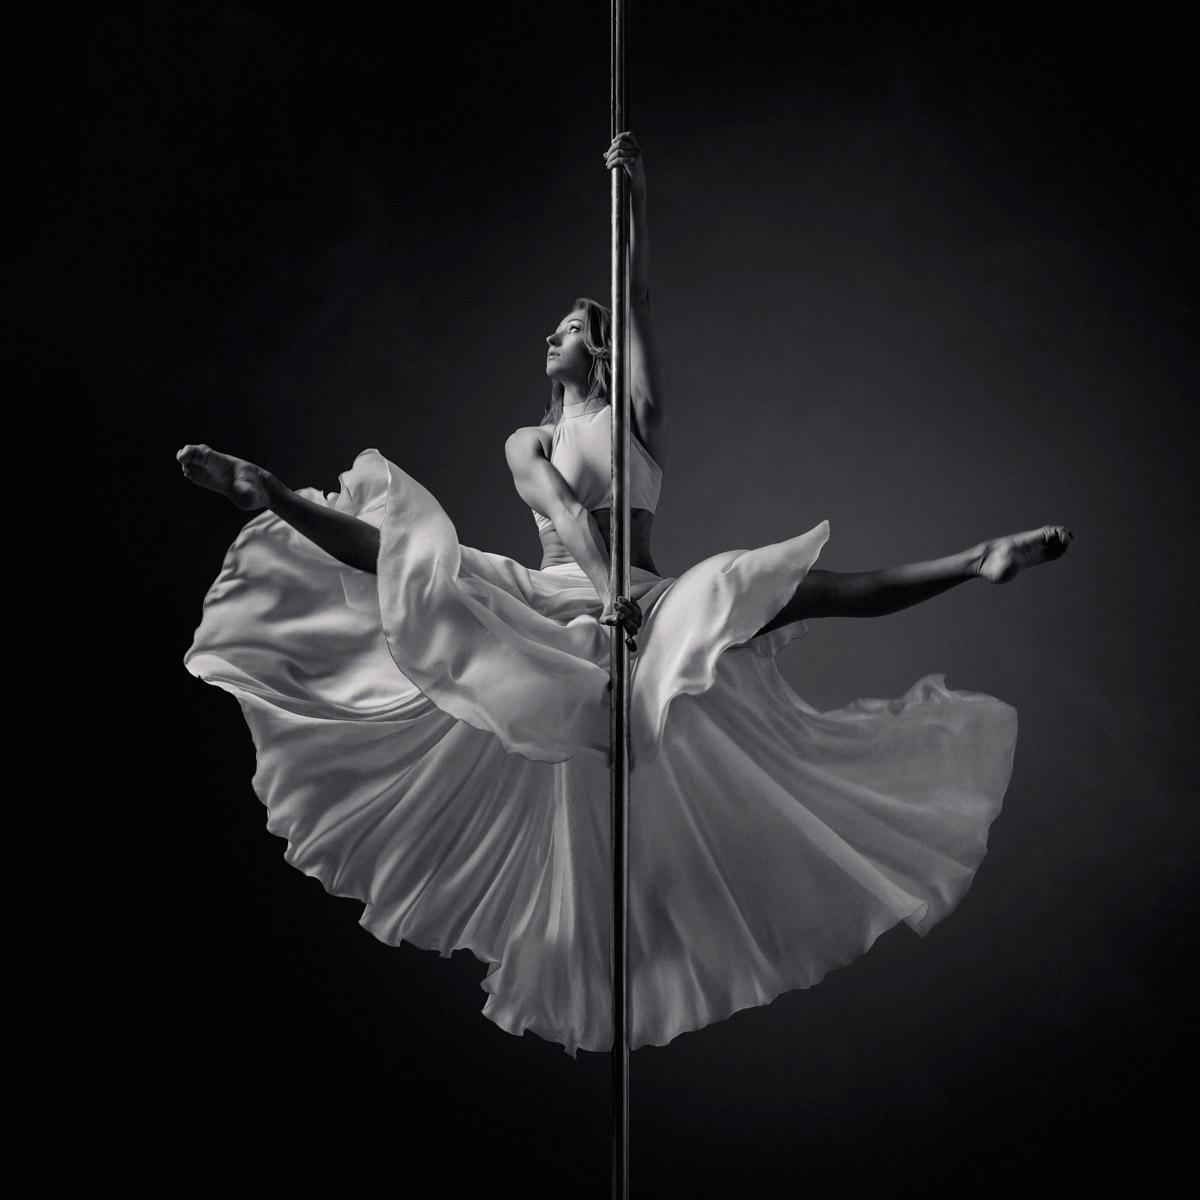 Anastasia-Skukhtorova Pole